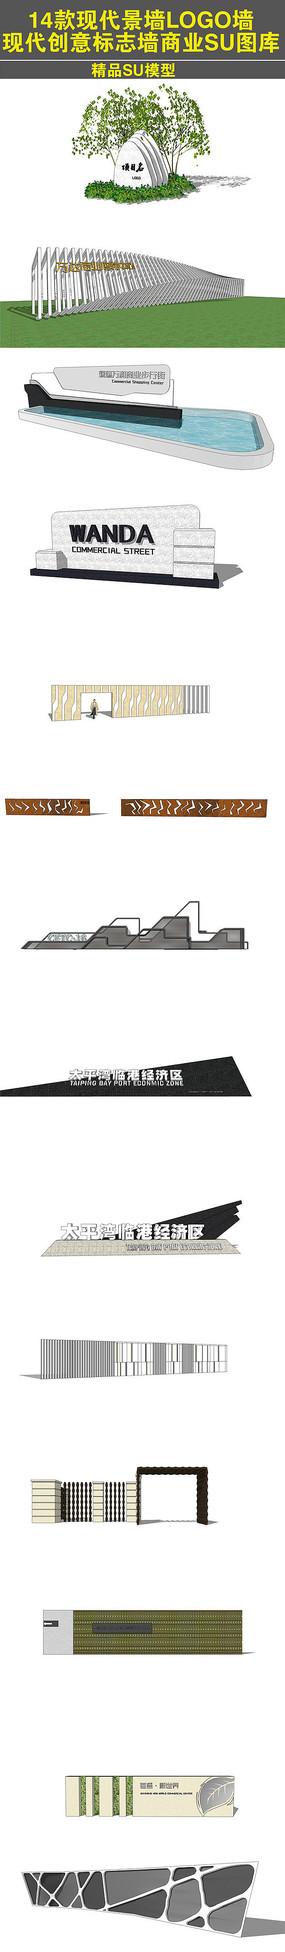 LOGO墻現代創意標志墻